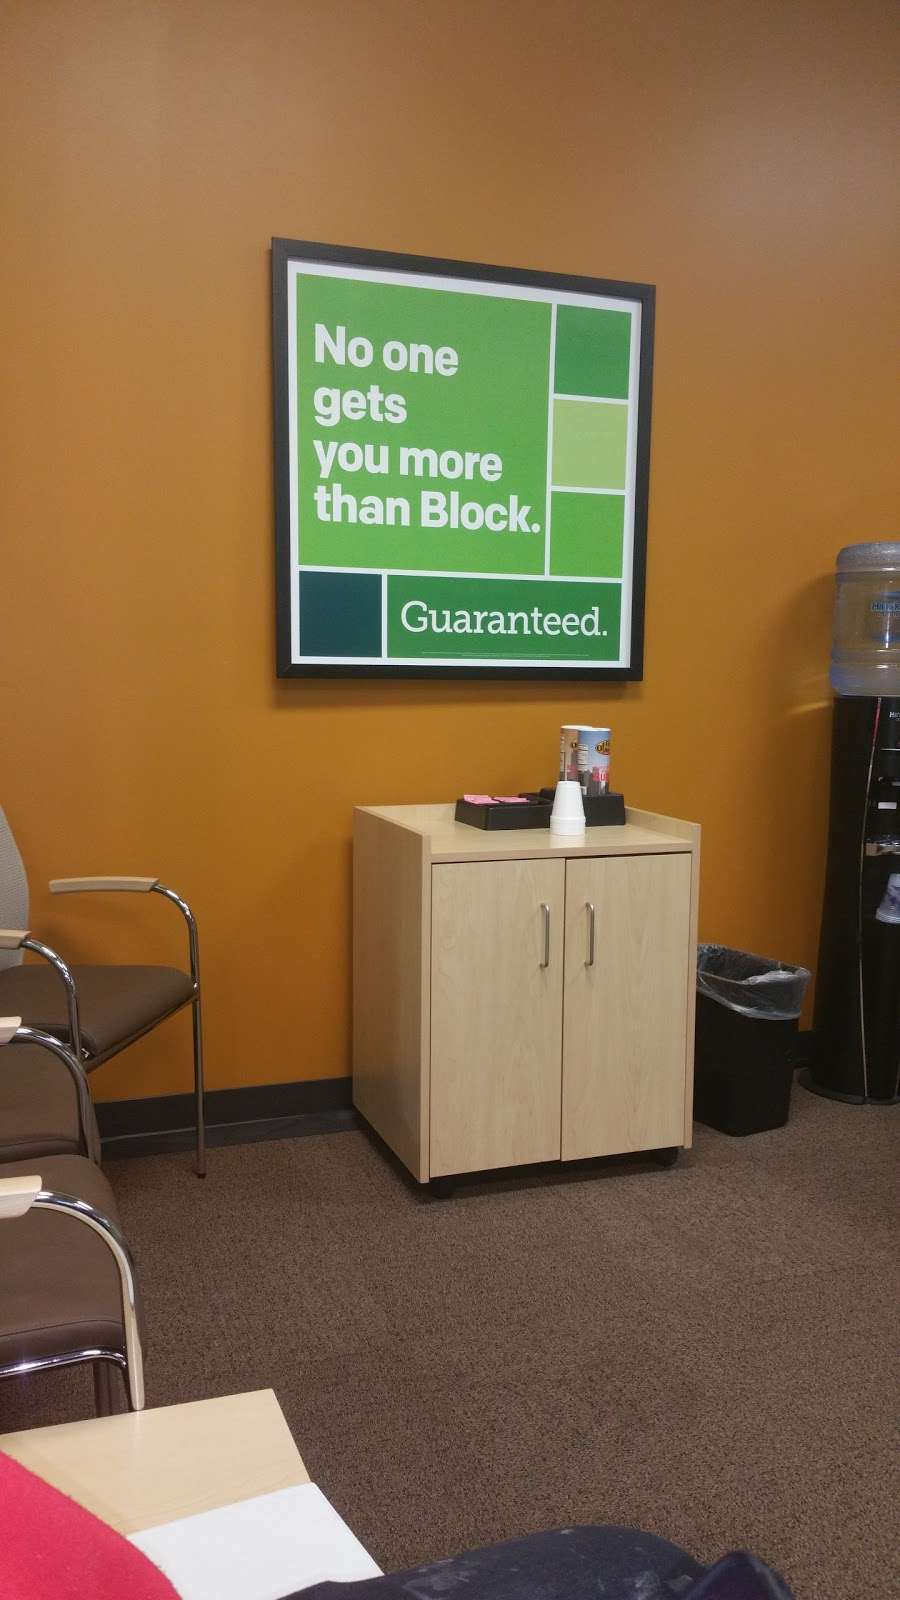 Glenlake Plaza - shopping mall  | Photo 4 of 10 | Address: 2599 E 65th St, Indianapolis, IN 46220, USA